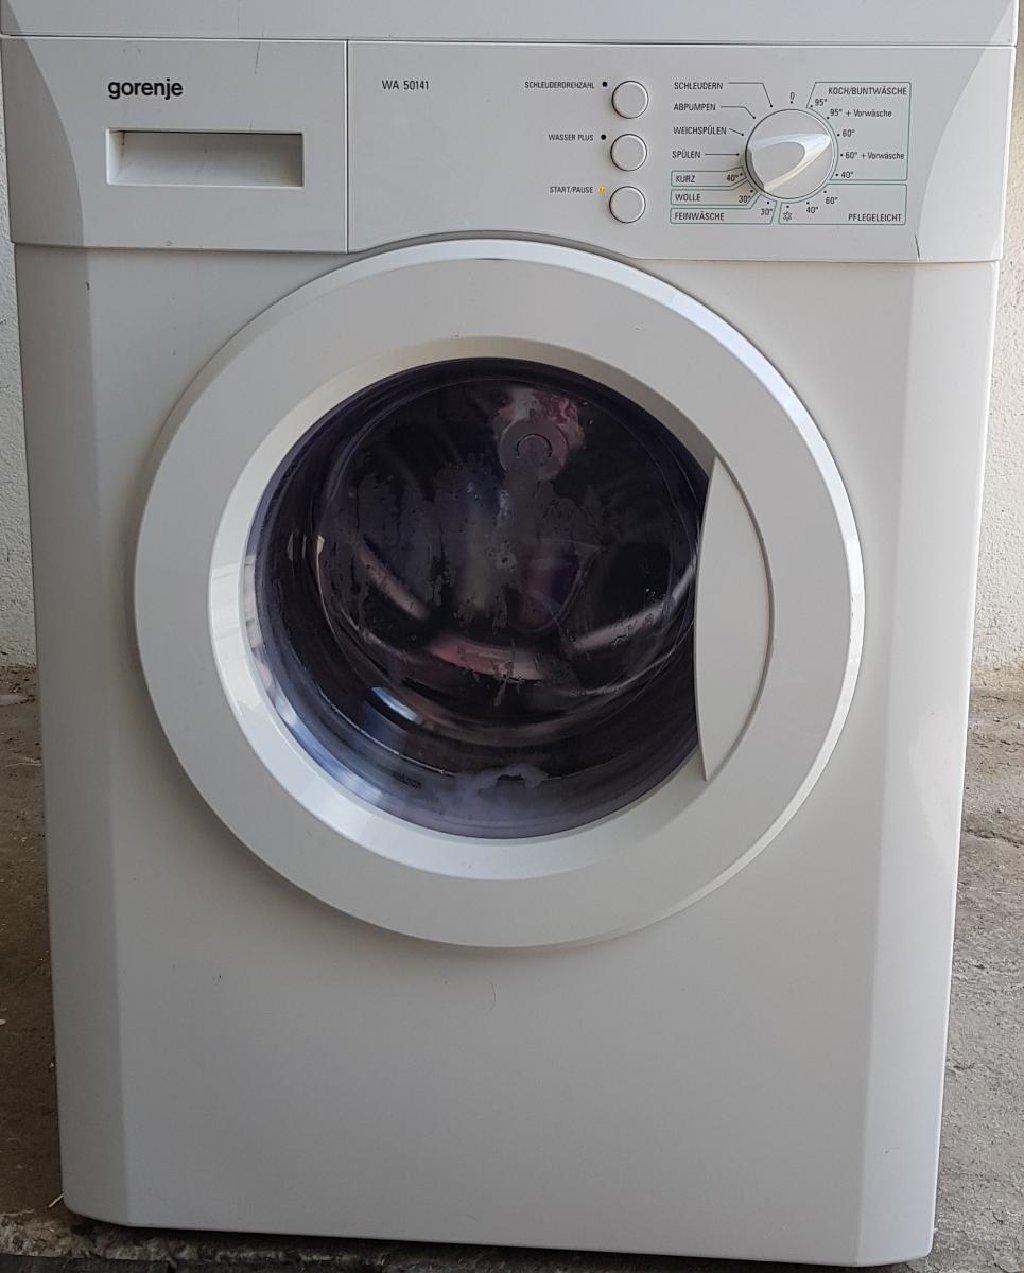 Frontalno Automatska Mašina za pranje Gorenje 5 kg